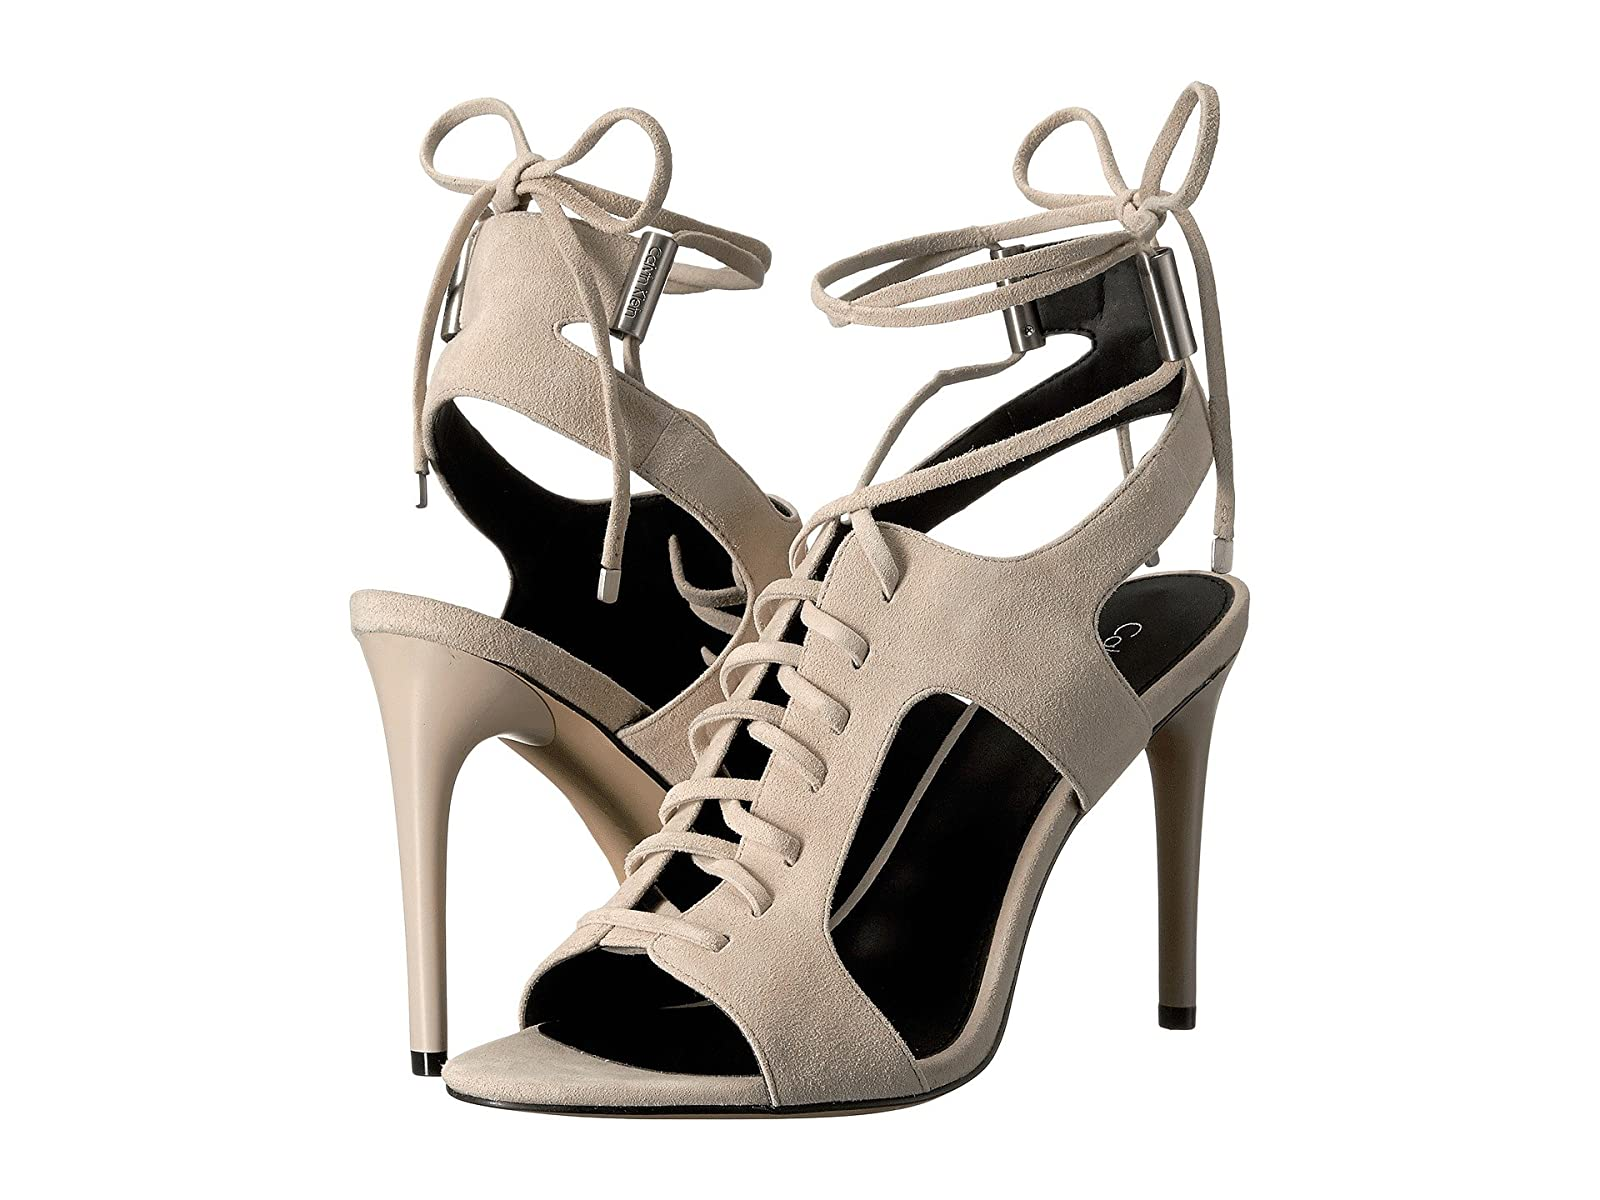 Calvin Klein SantosCheap and distinctive eye-catching shoes